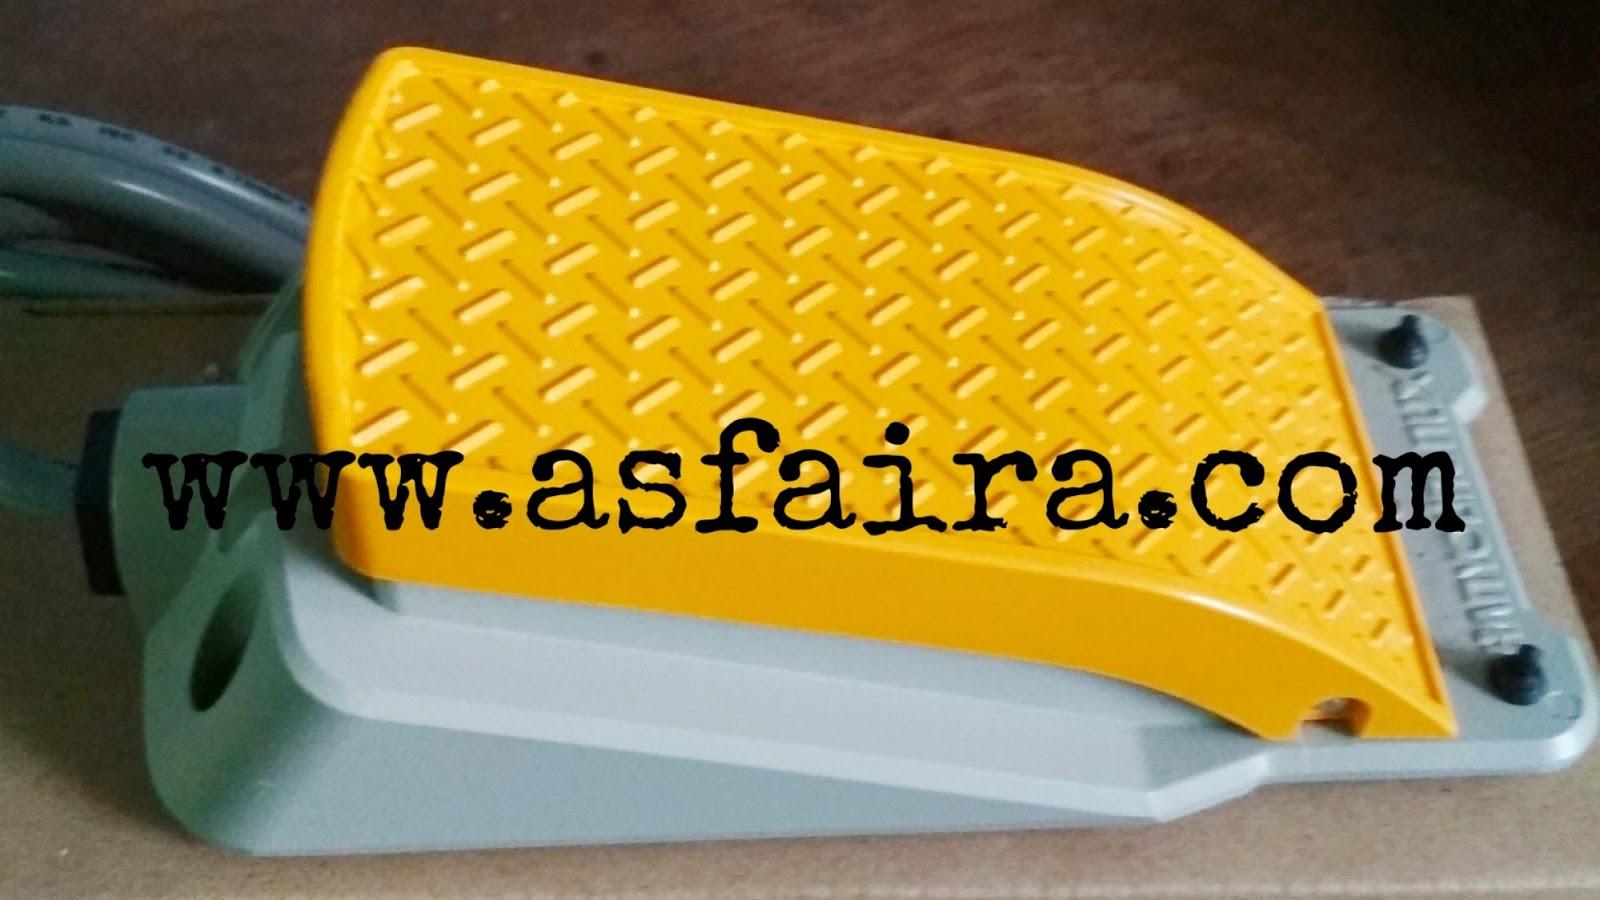 www.asfaira.com